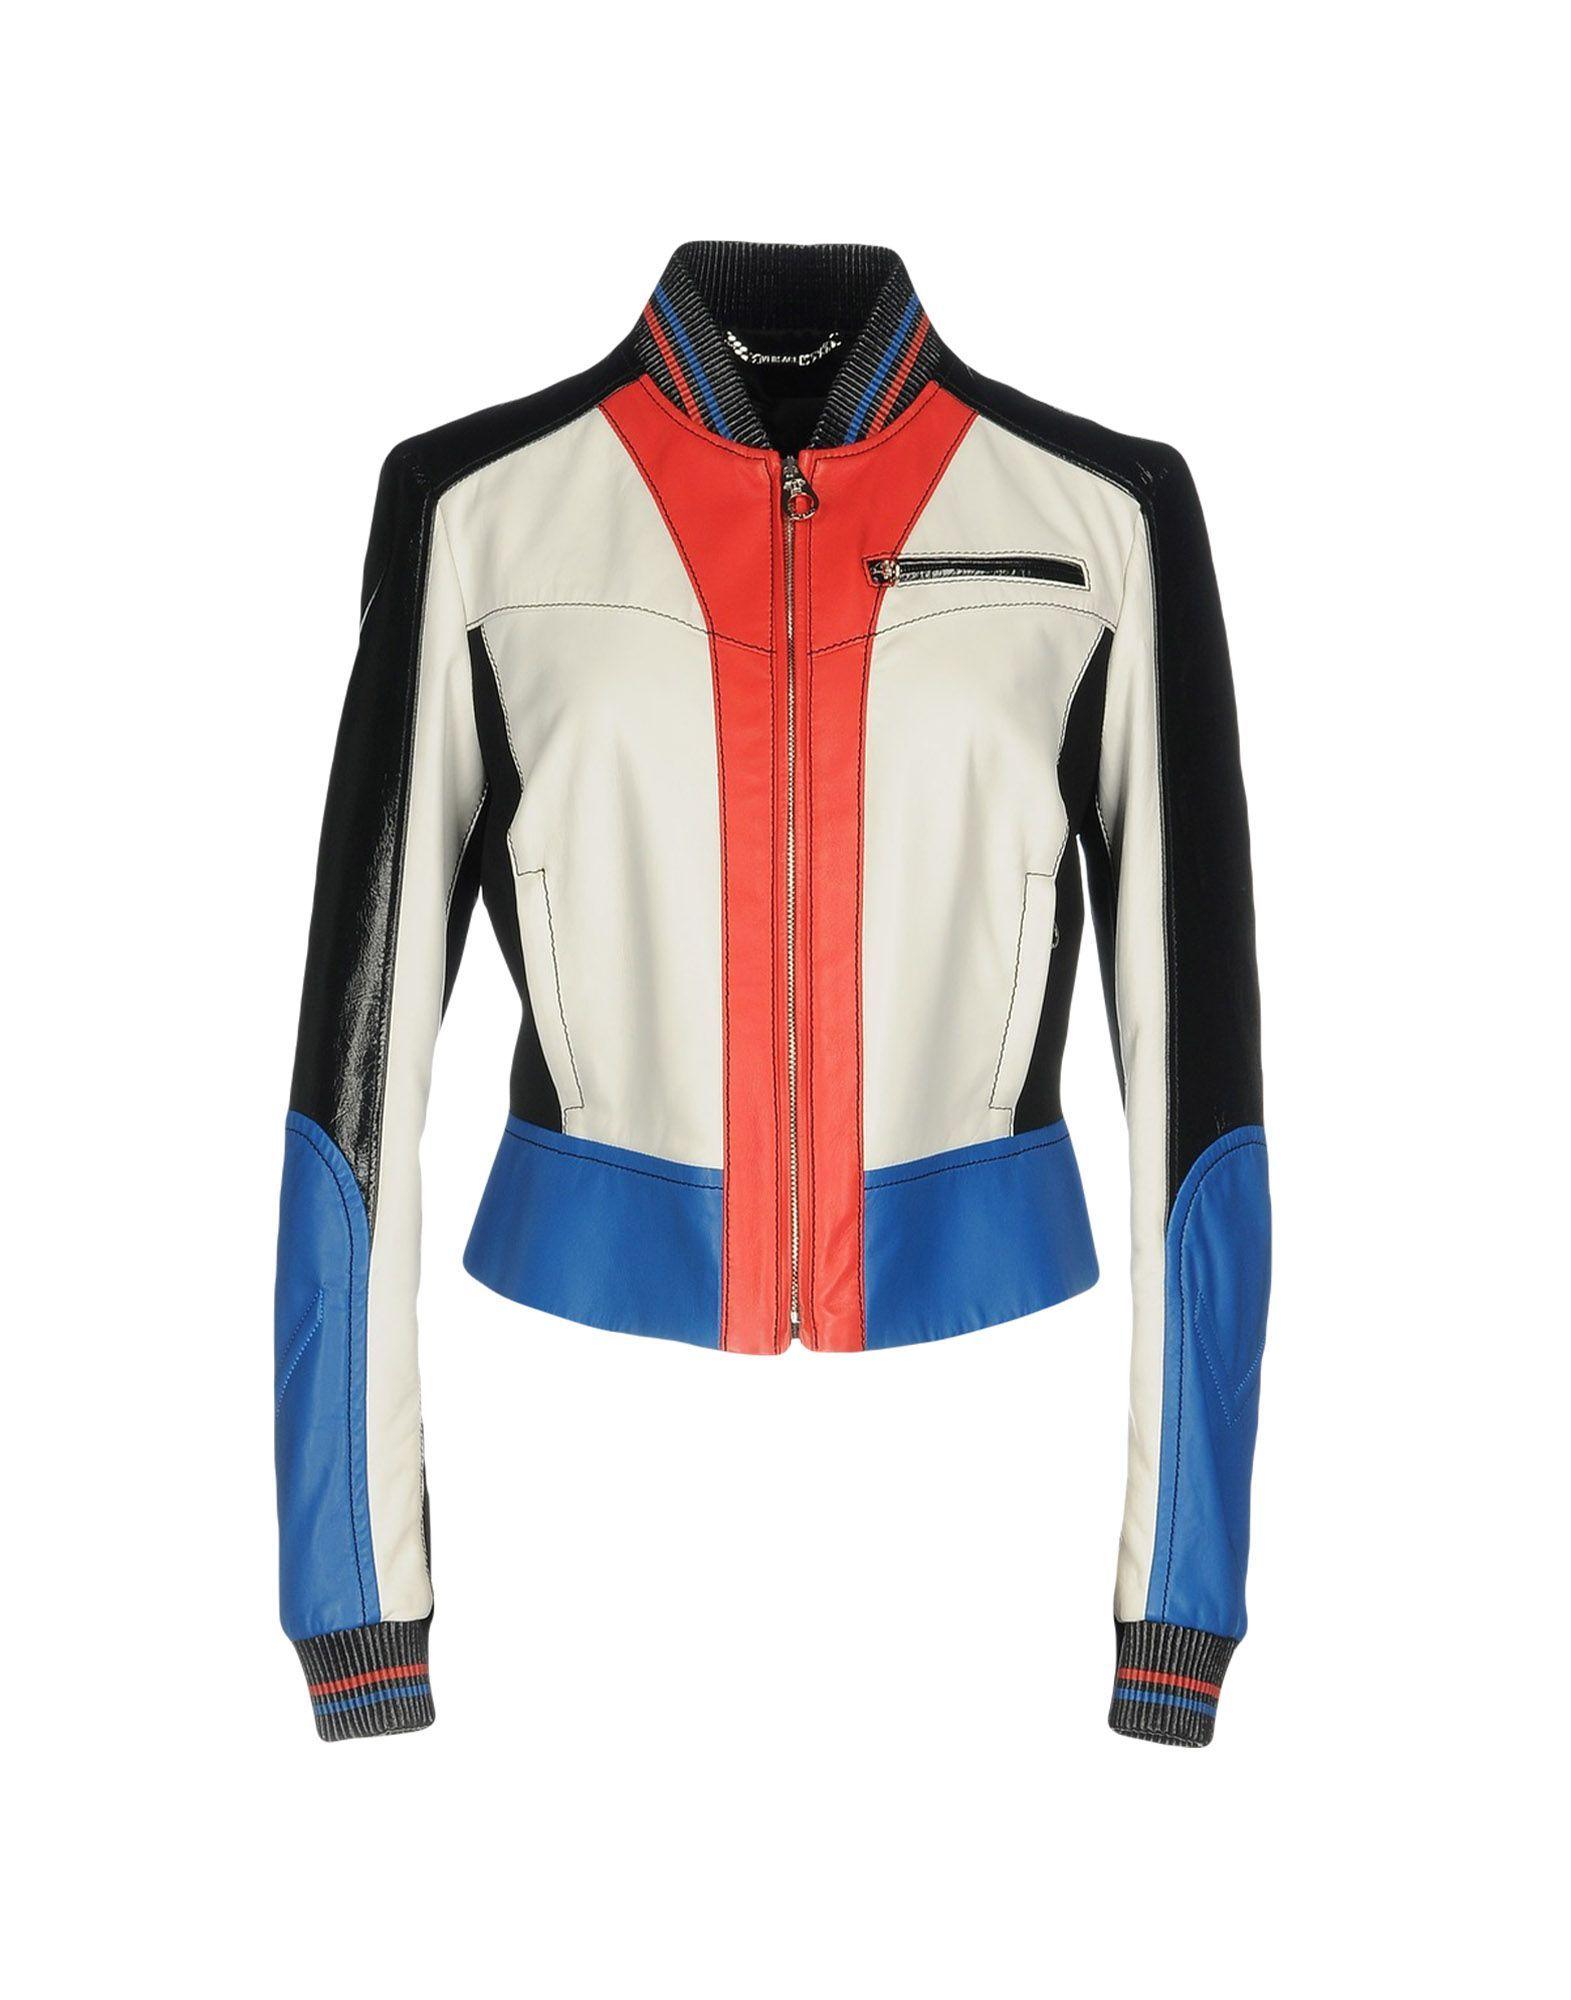 Versace Jackets Versace Cloth [ 2000 x 1571 Pixel ]